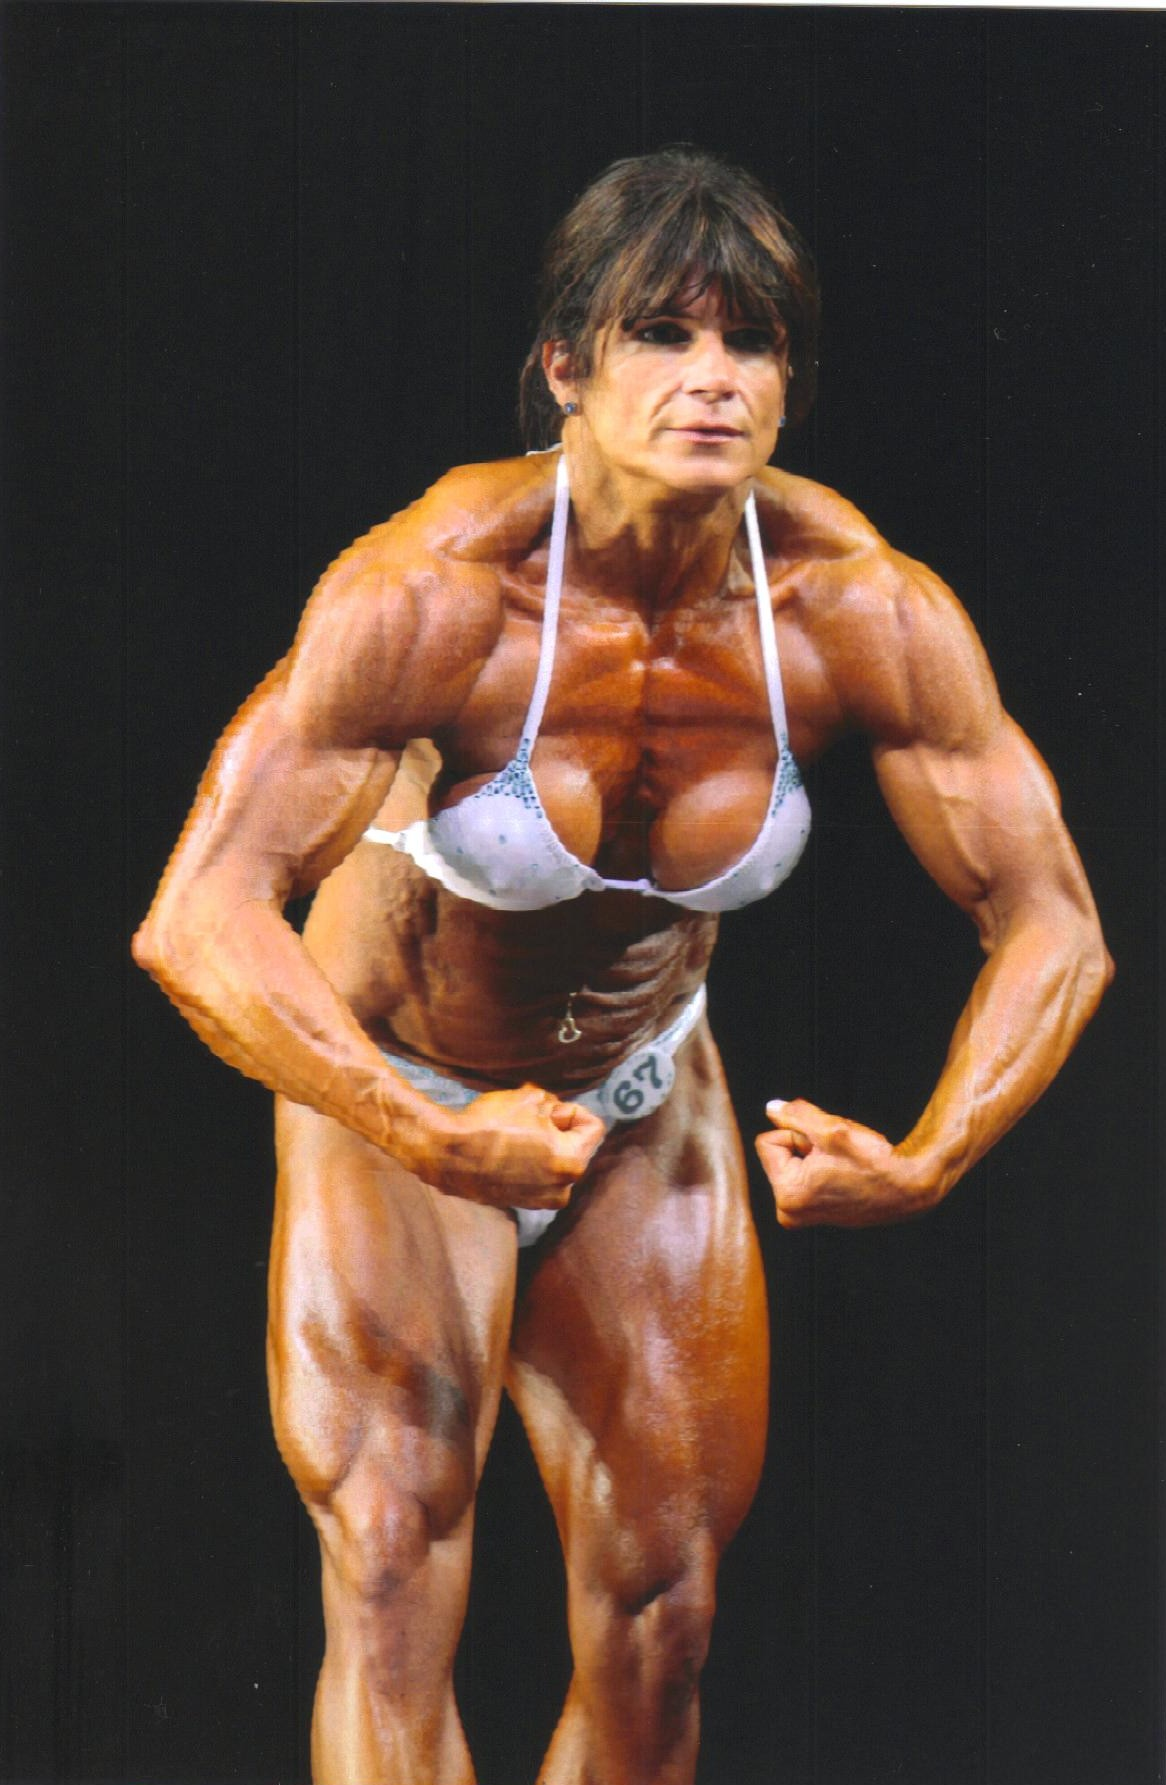 Fbb most muscular